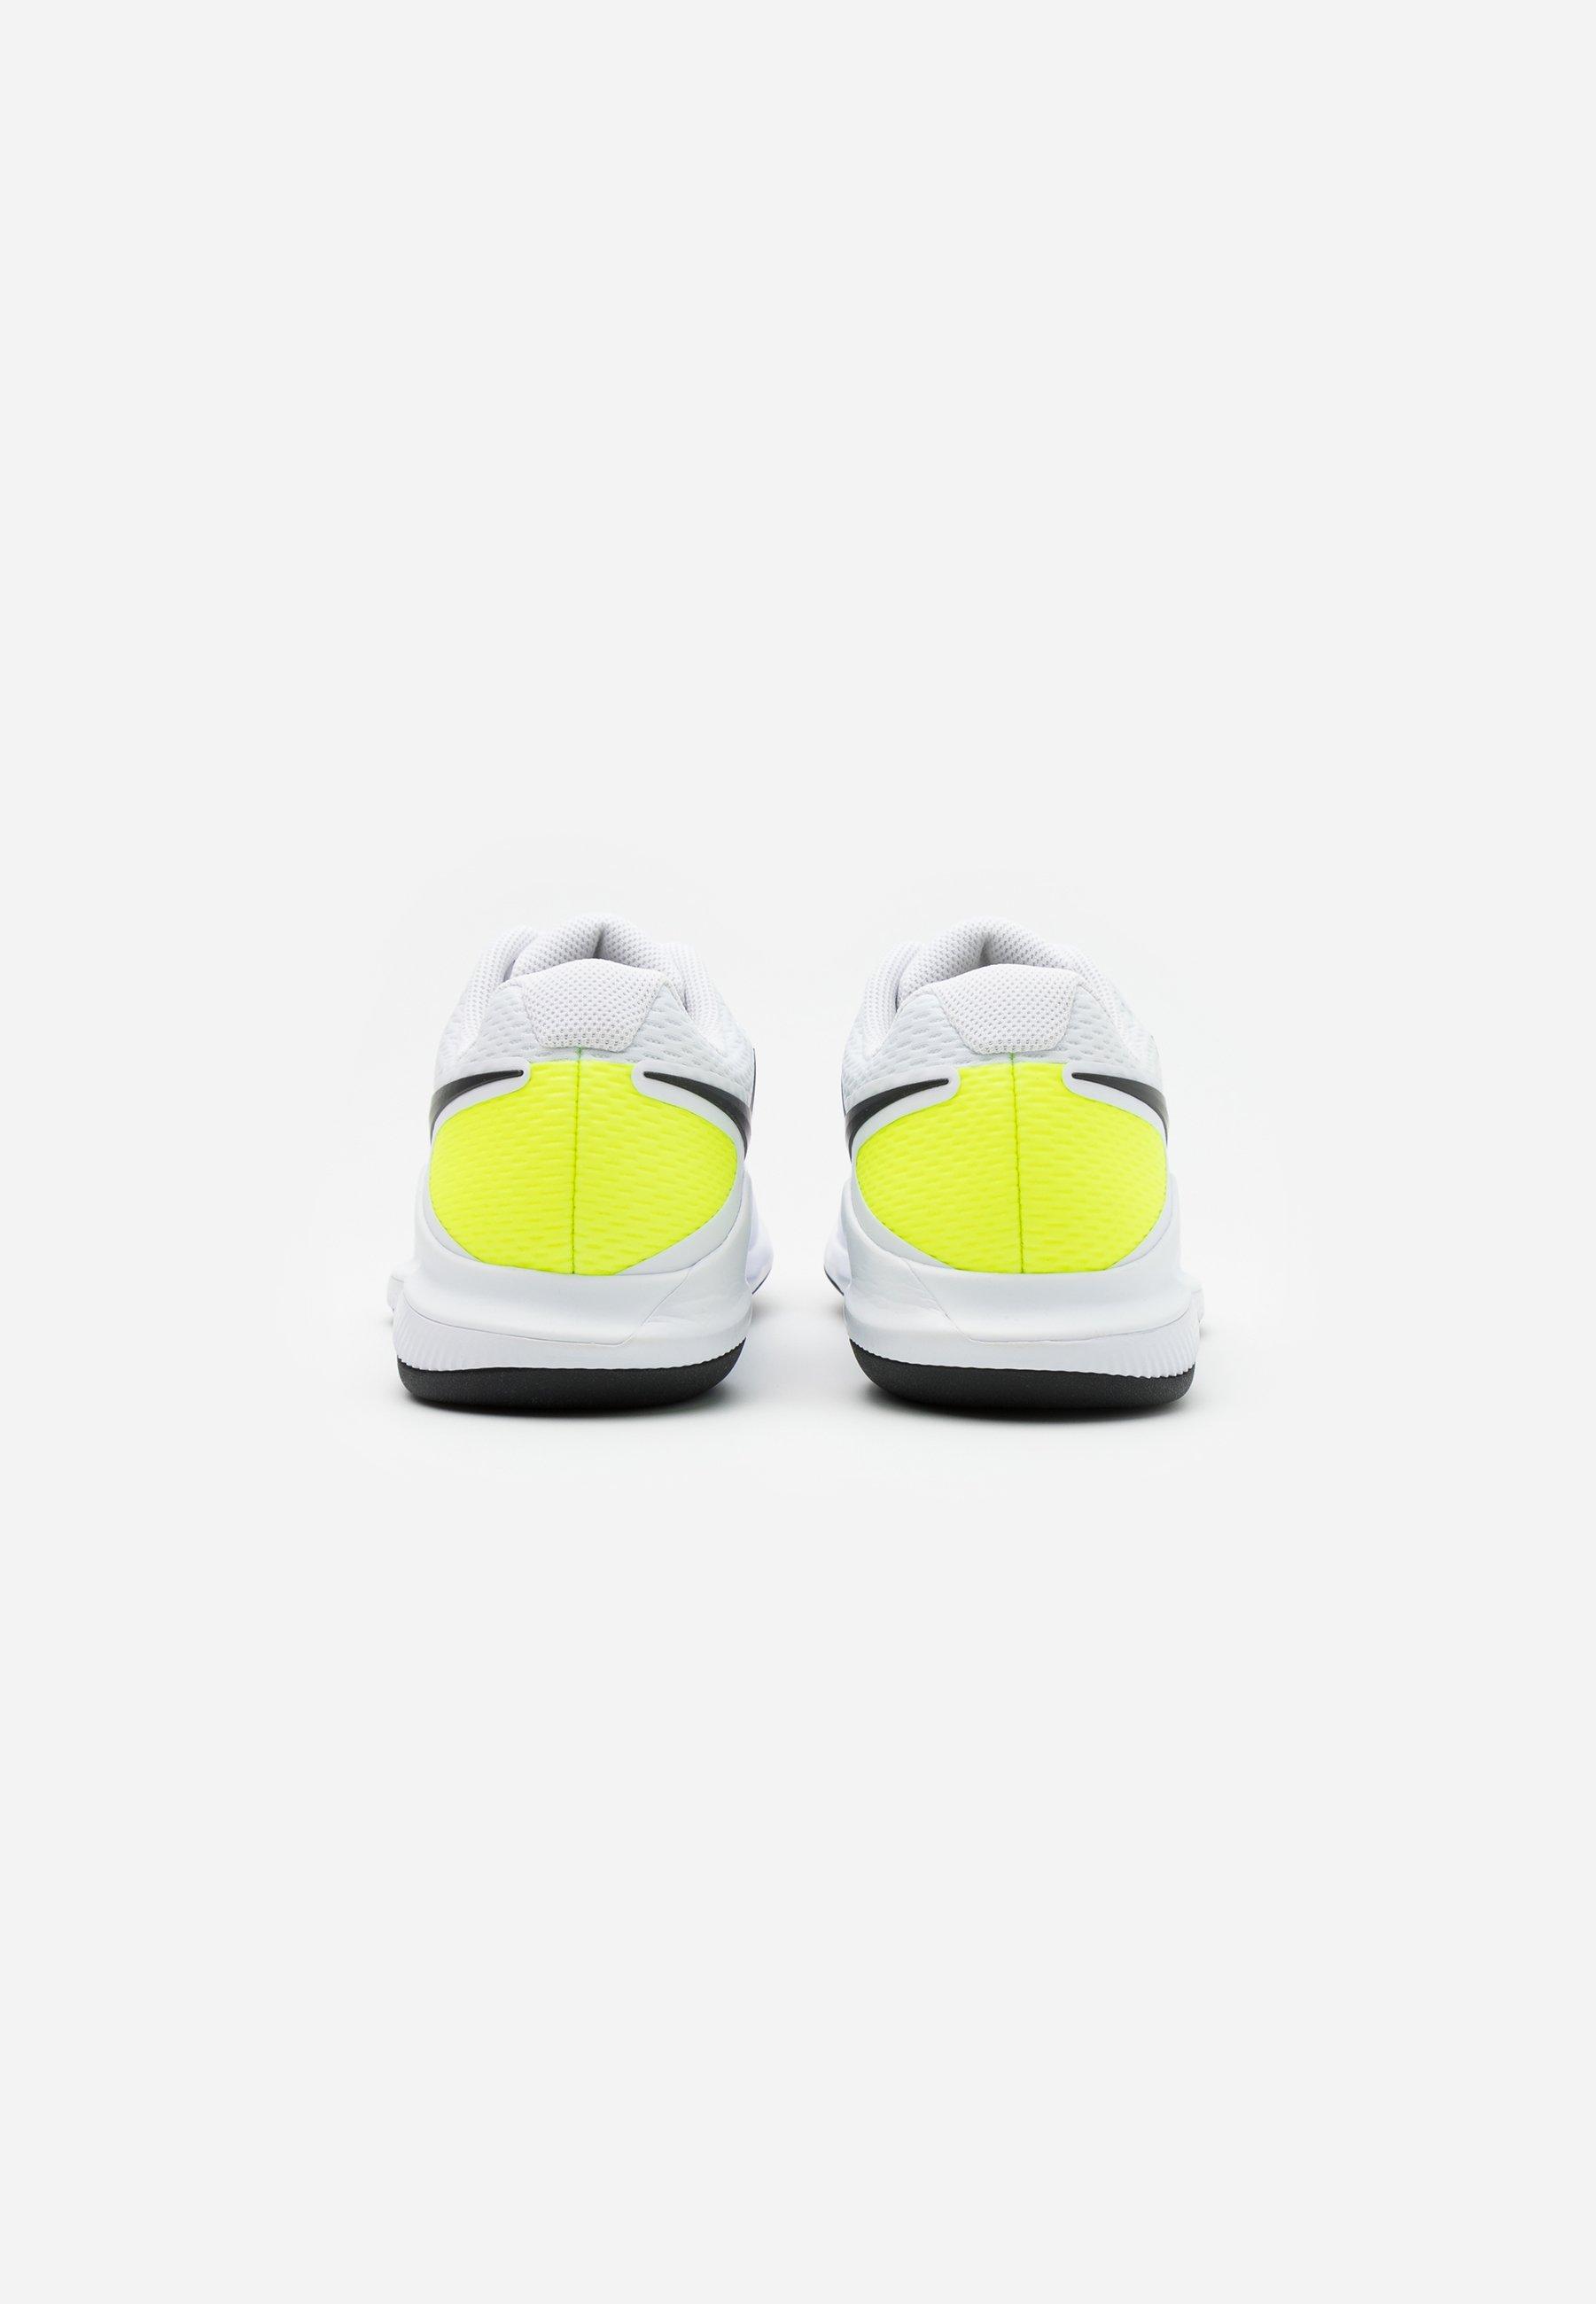 Compras Calzado de hombre Nike Performance AIR ZOOM VAPOR X CPT Zapatillas de tenis para moqueta sintética white/black/volt bU7aQi